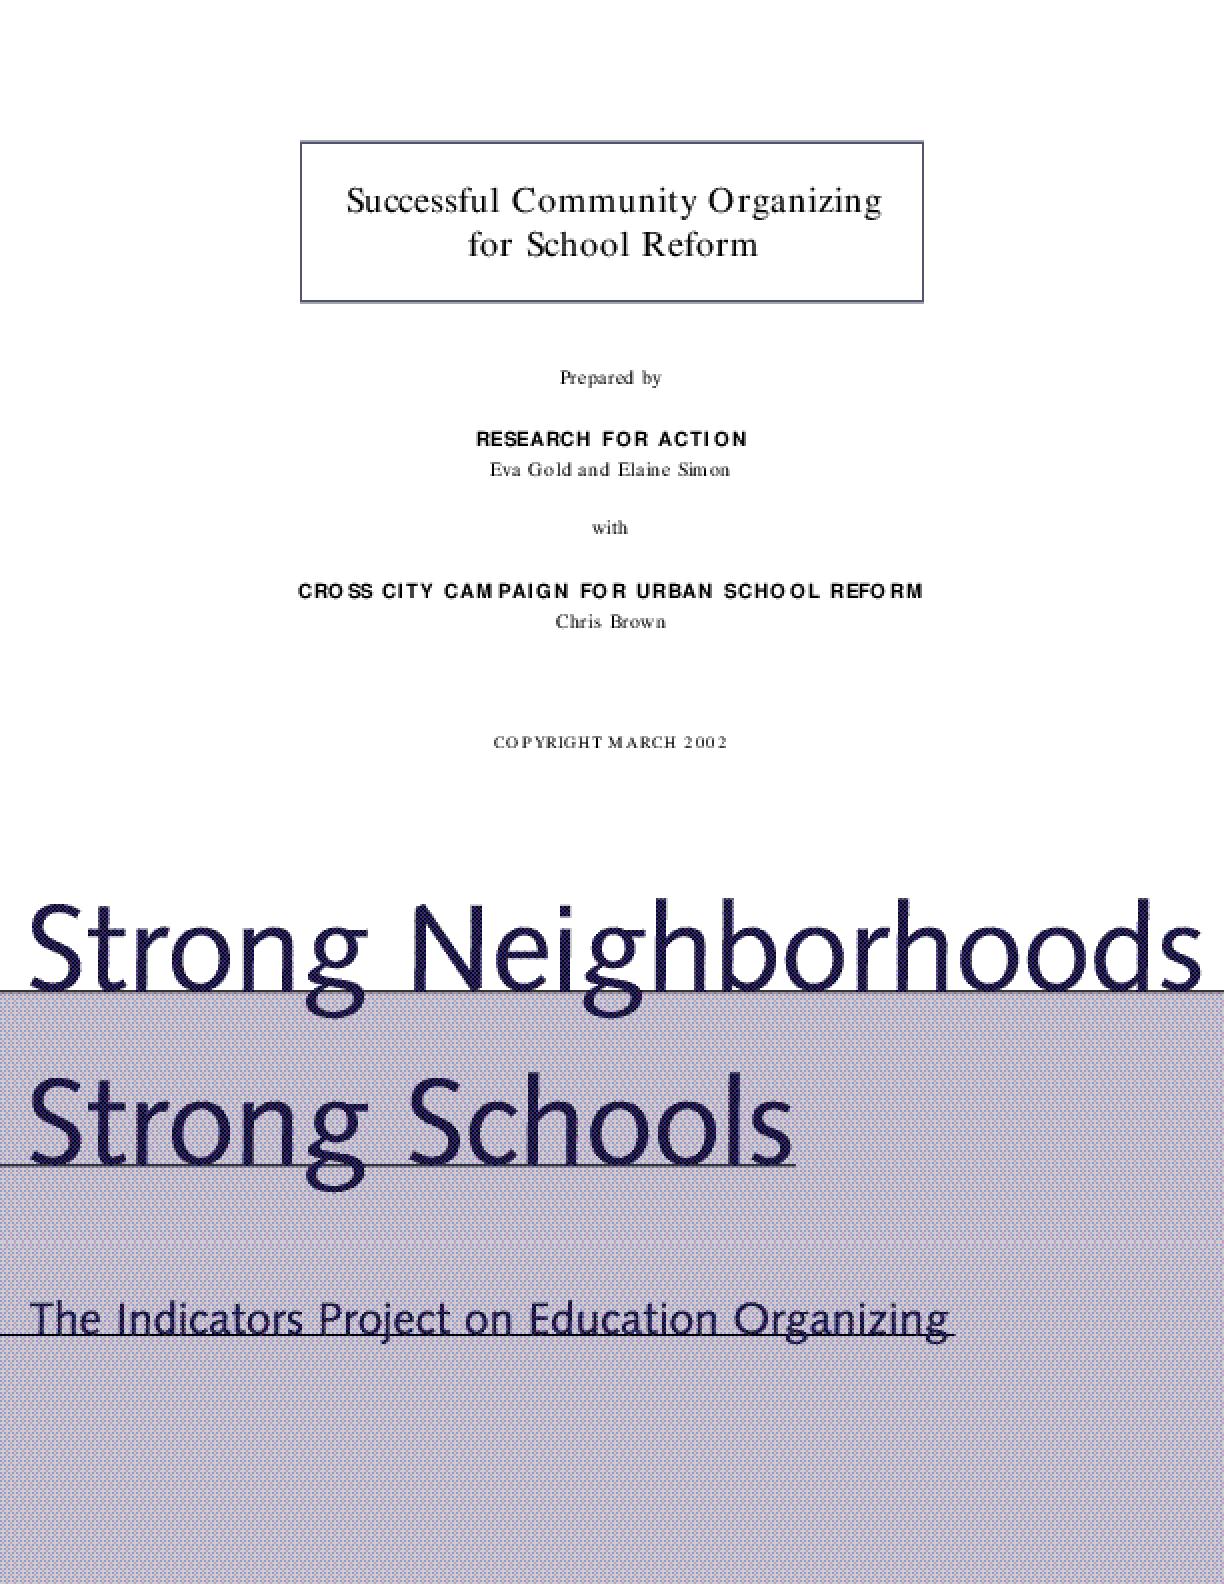 Strong Neighborhoods, Strong Schools